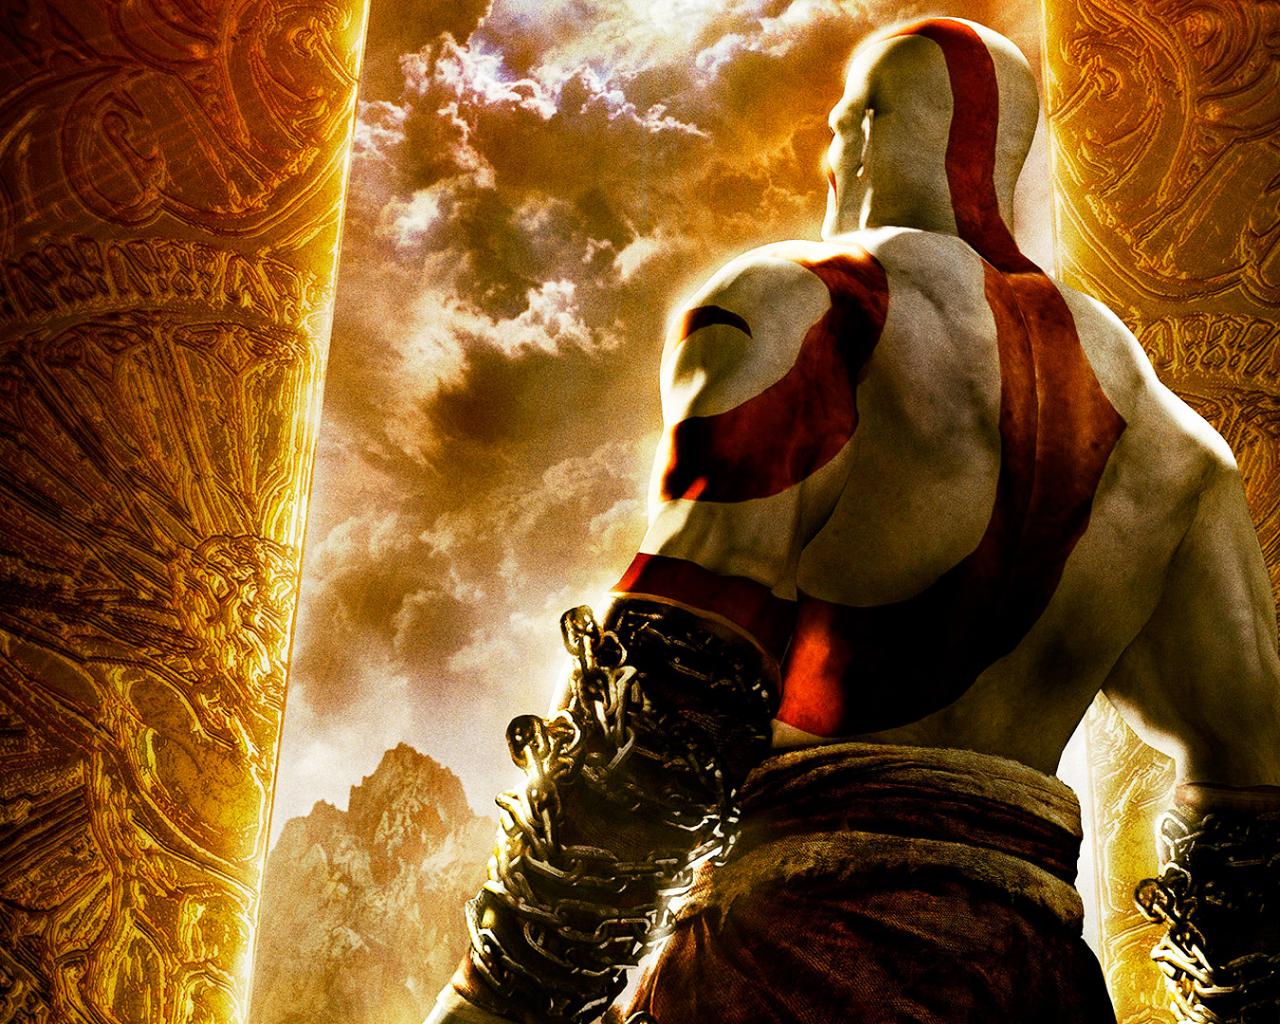 Free Download Games Wallpapers God Of War 3 Wallpaper Kratos